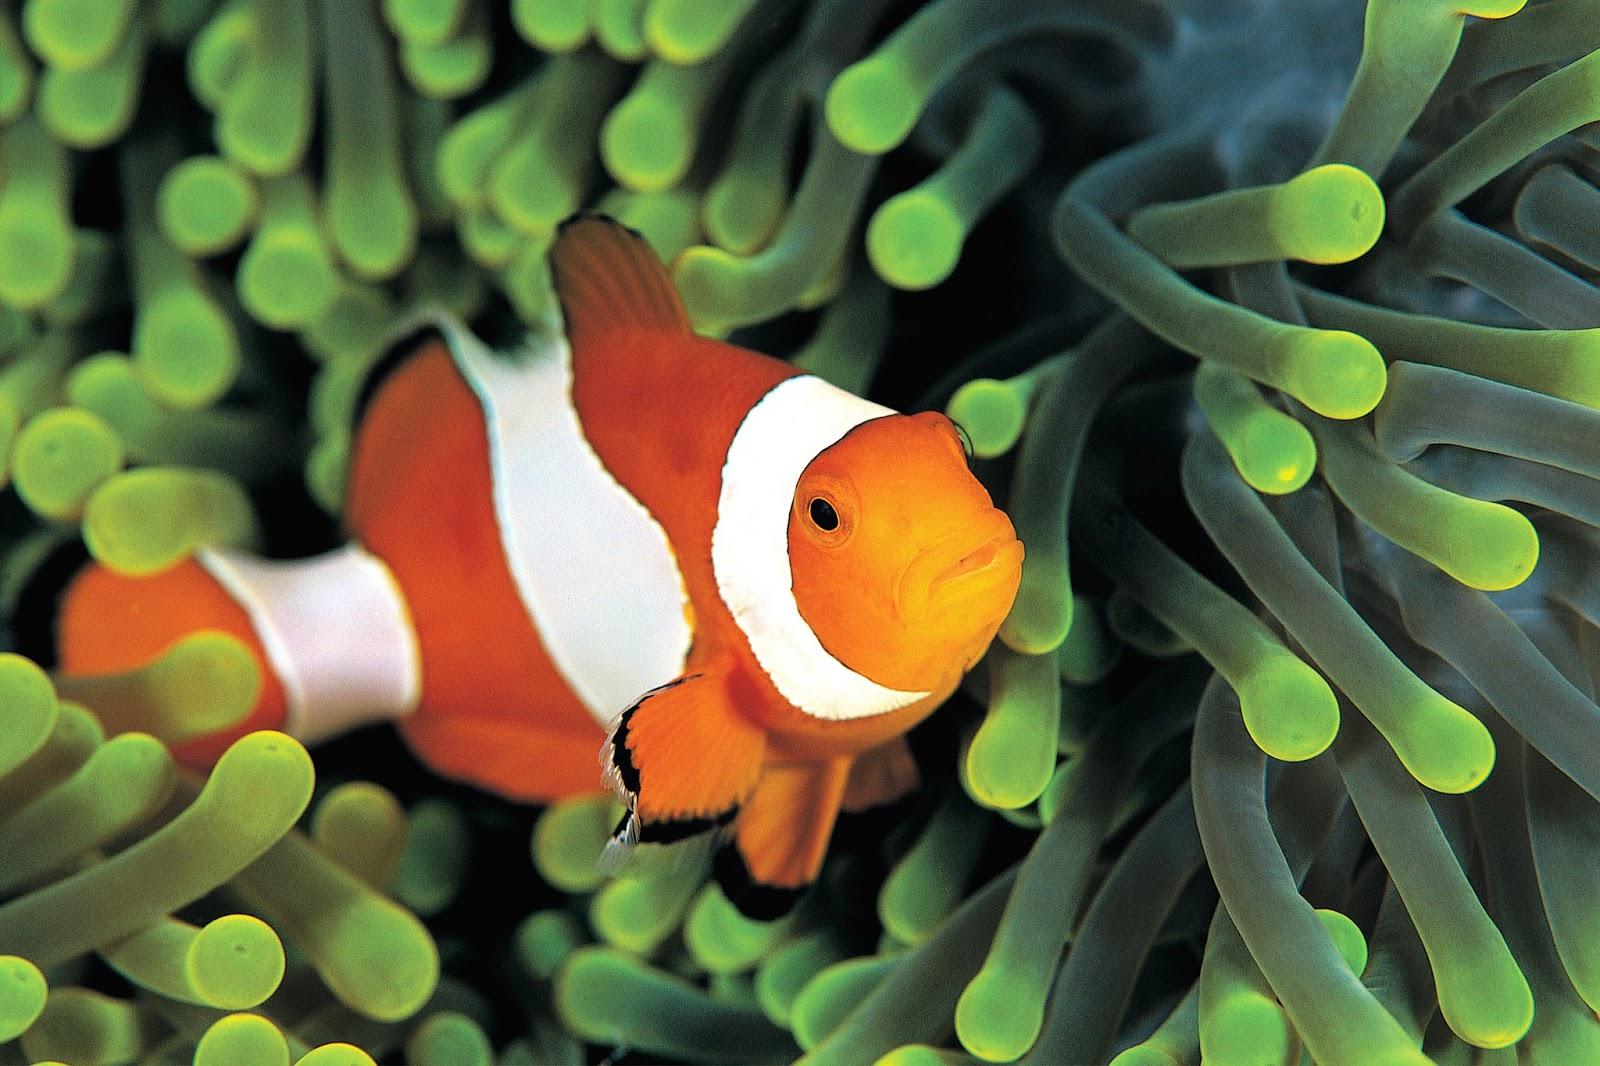 Fond d'écran poisson animé - Fonds d'écran HD